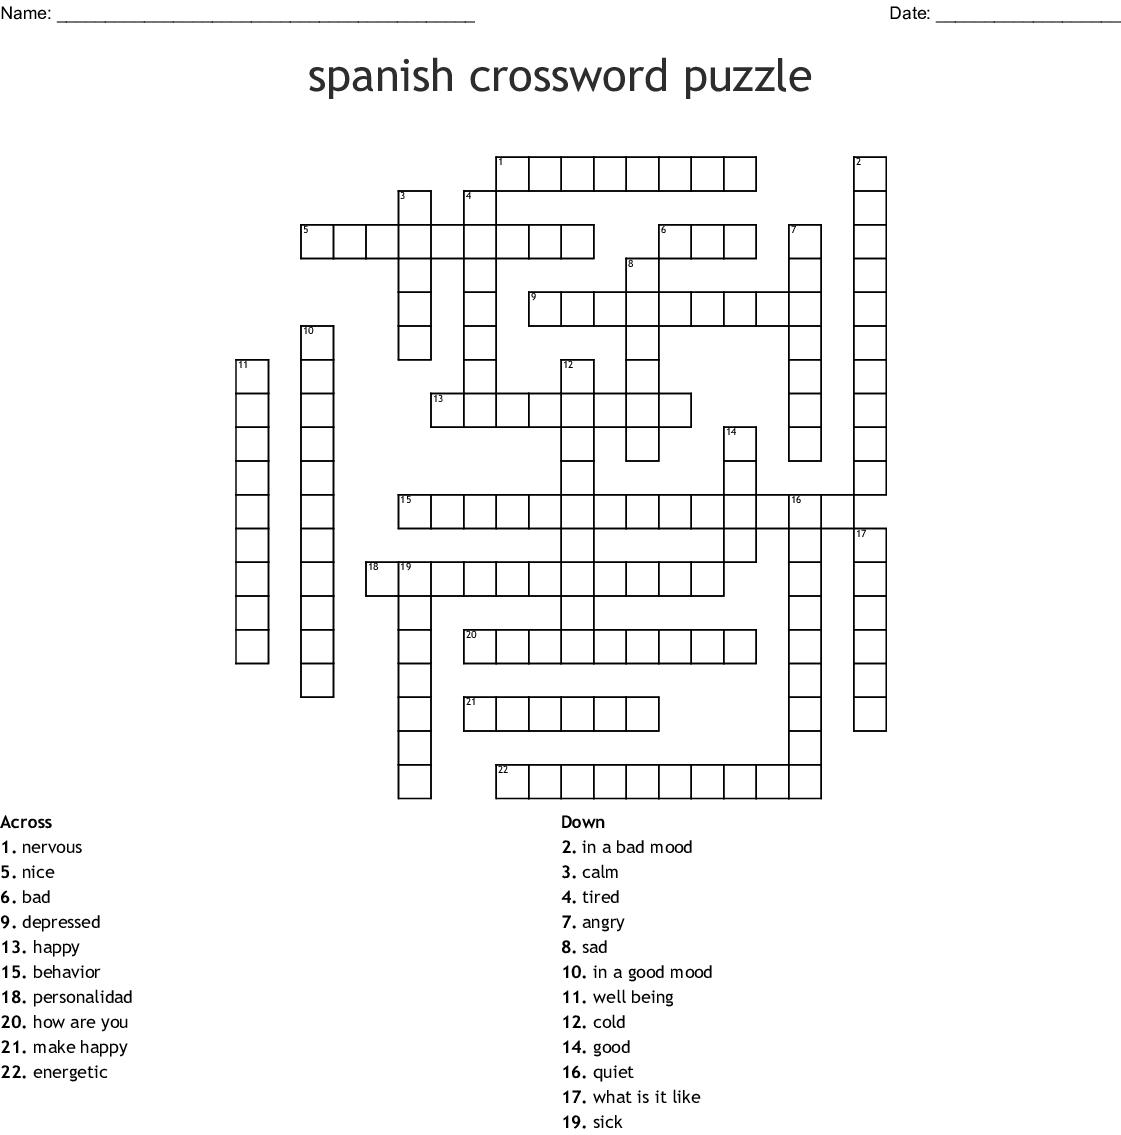 Spanish Crossword Puzzle - Wordmint